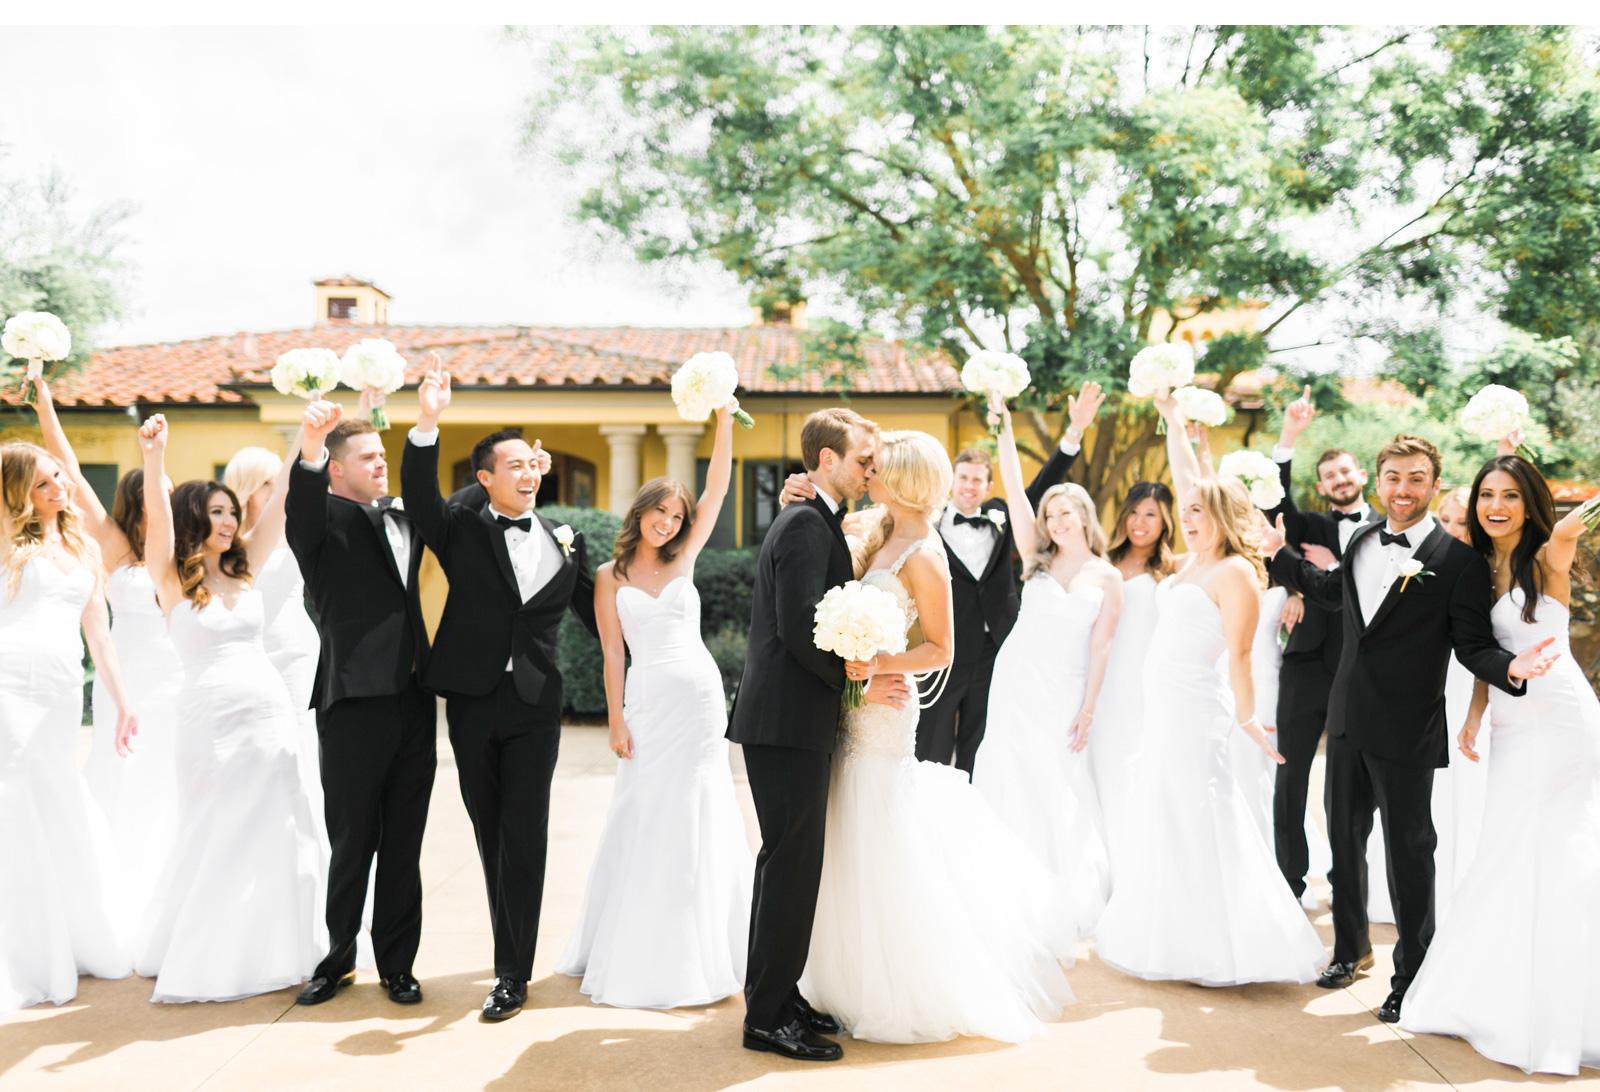 Southern-California-Wedding-Photographer-Natalie-Schutt-Photography_12.jpg